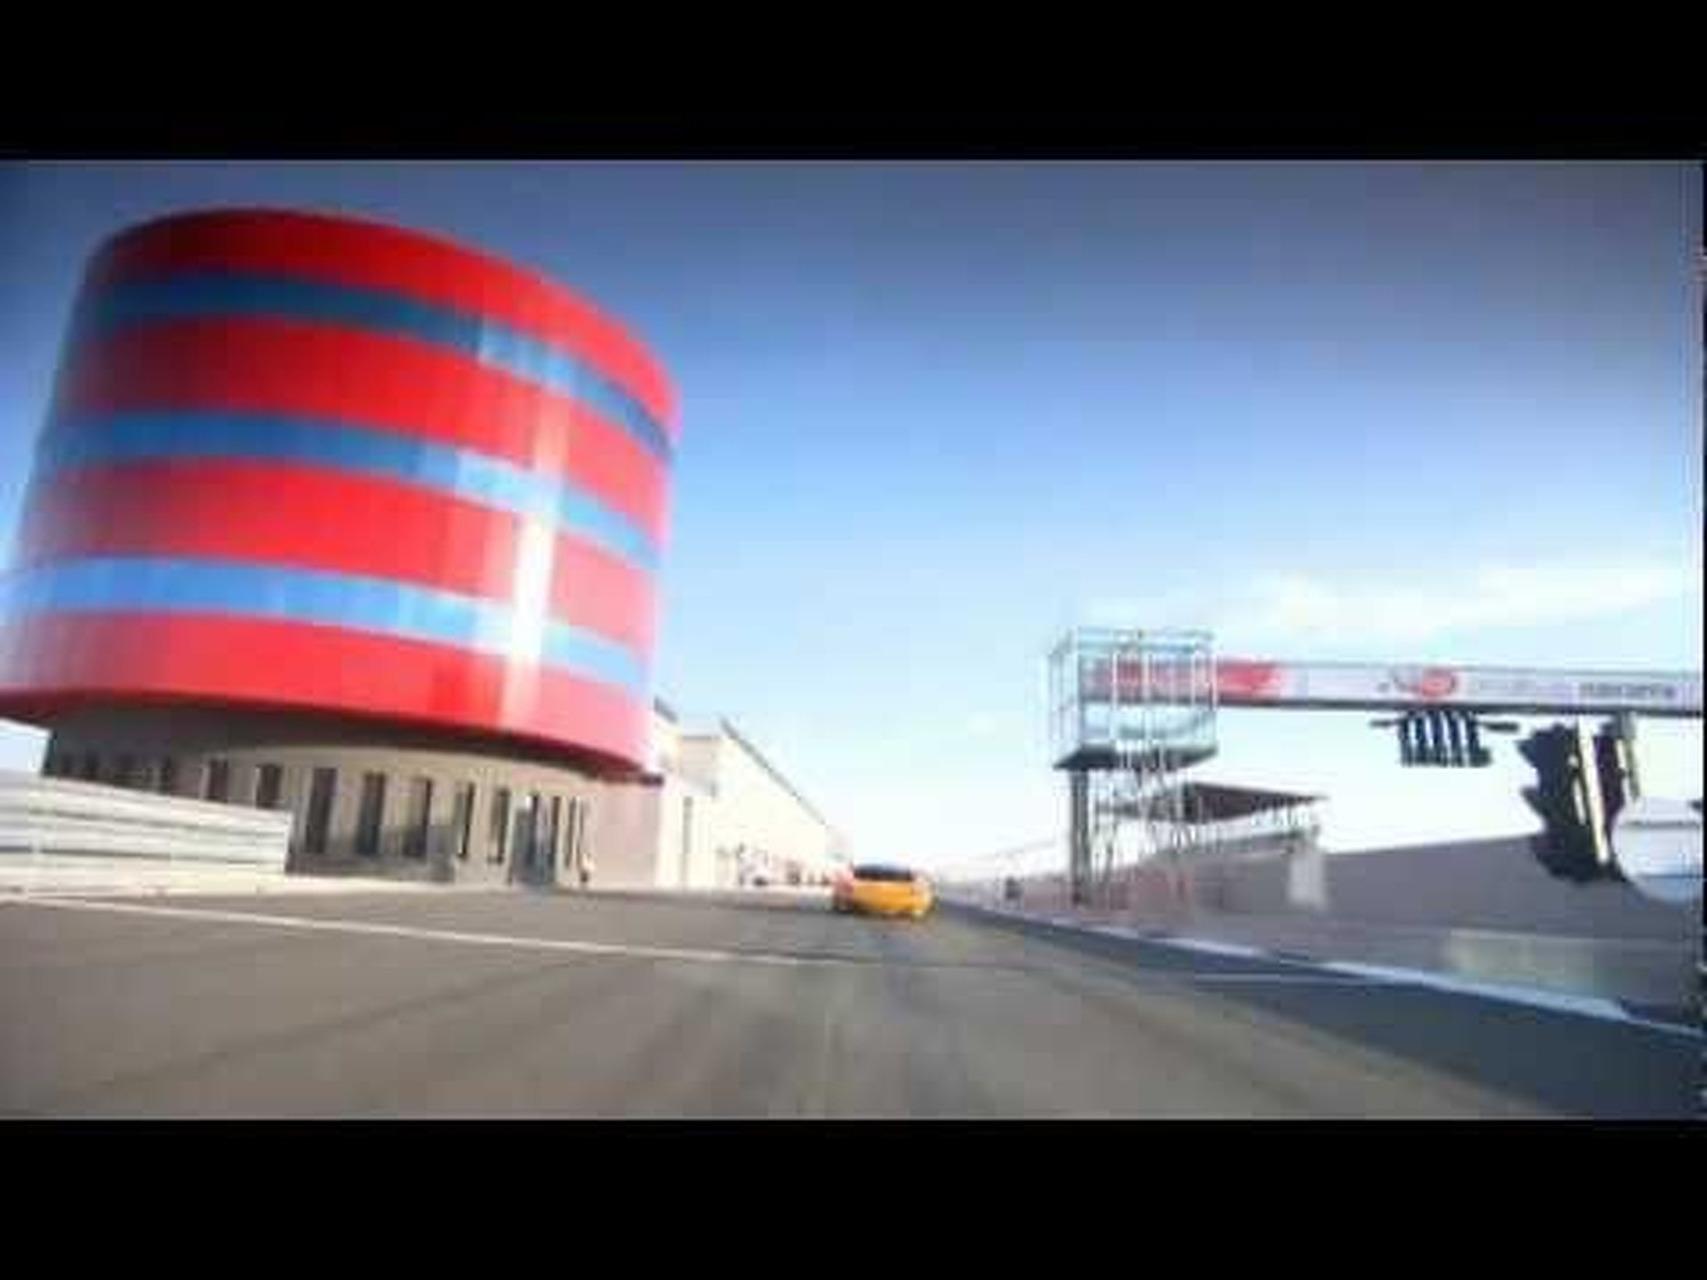 McLaren MP4-12C GT3 Tracking